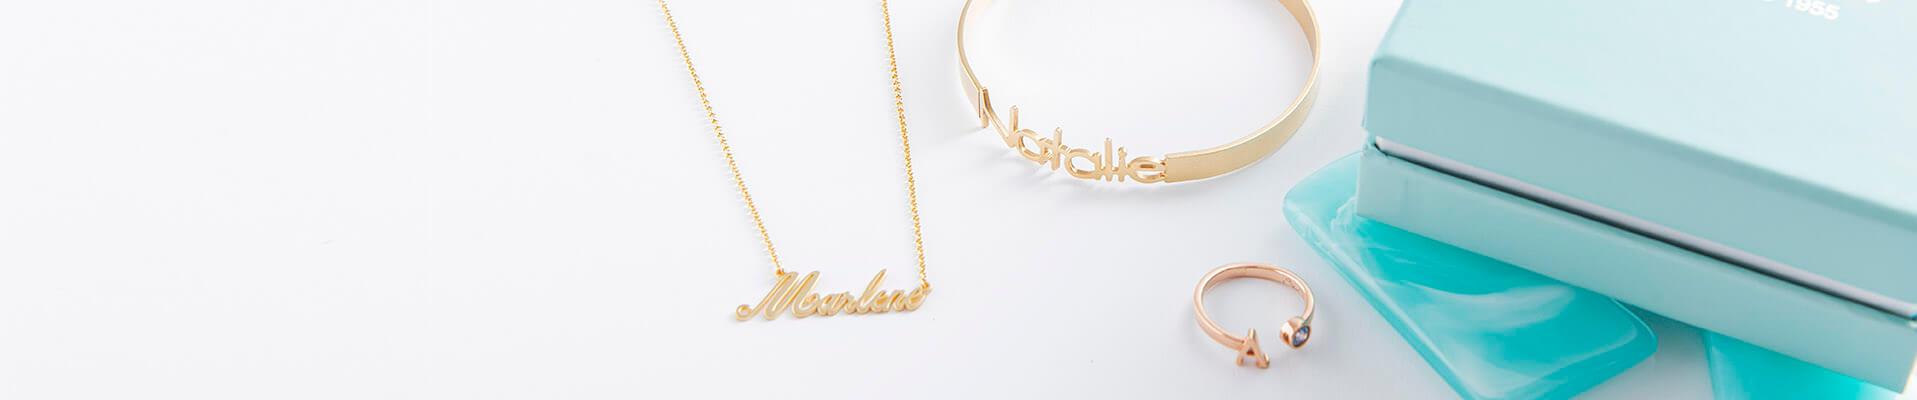 name jewelry web bannner